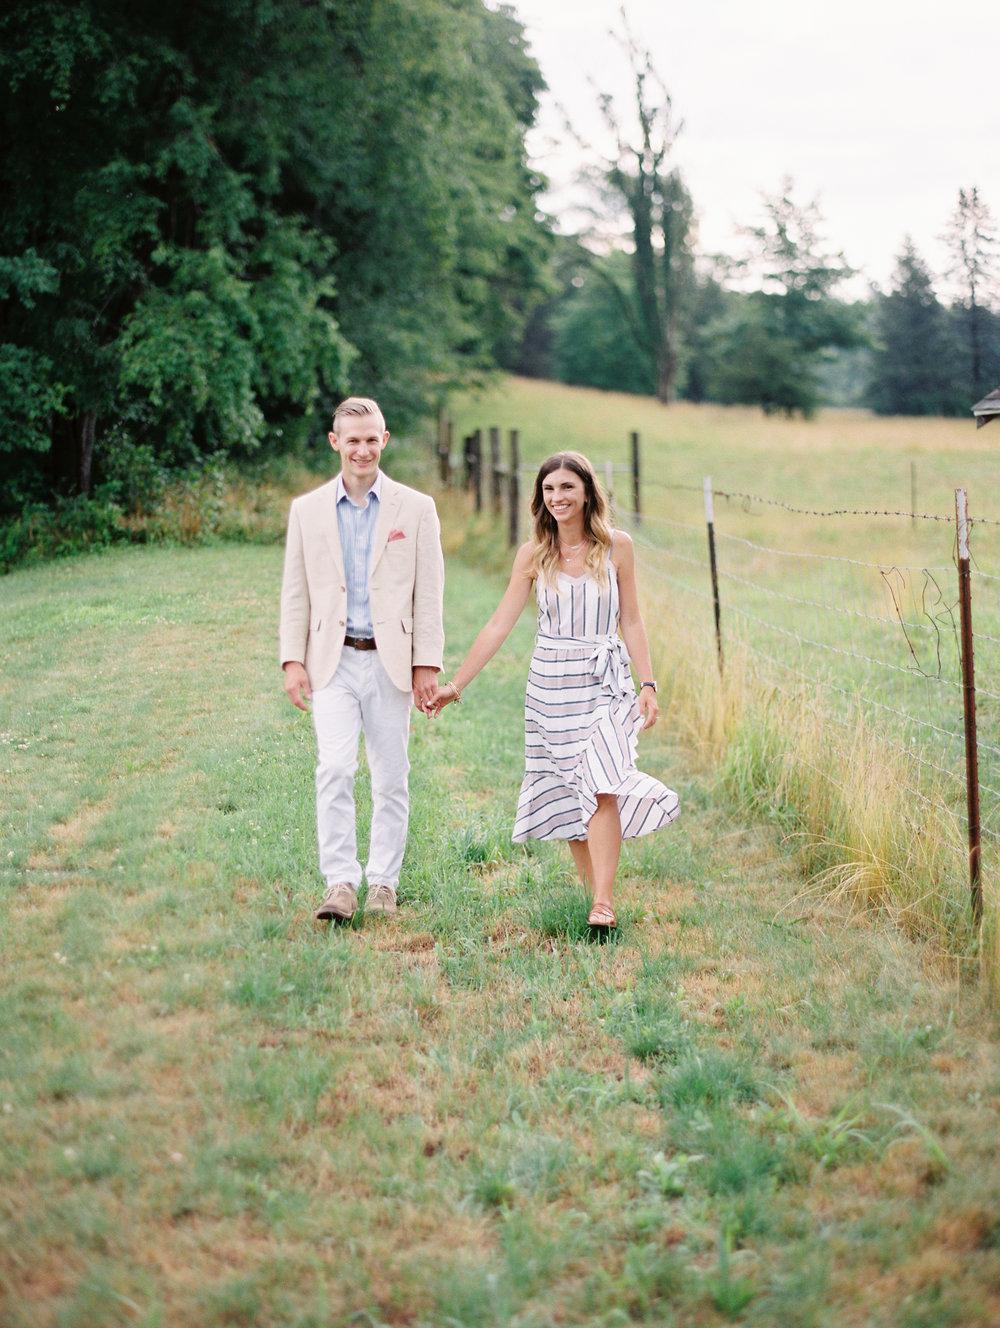 Kerri+Austin+Lavender+Field+Engagement-74.jpg